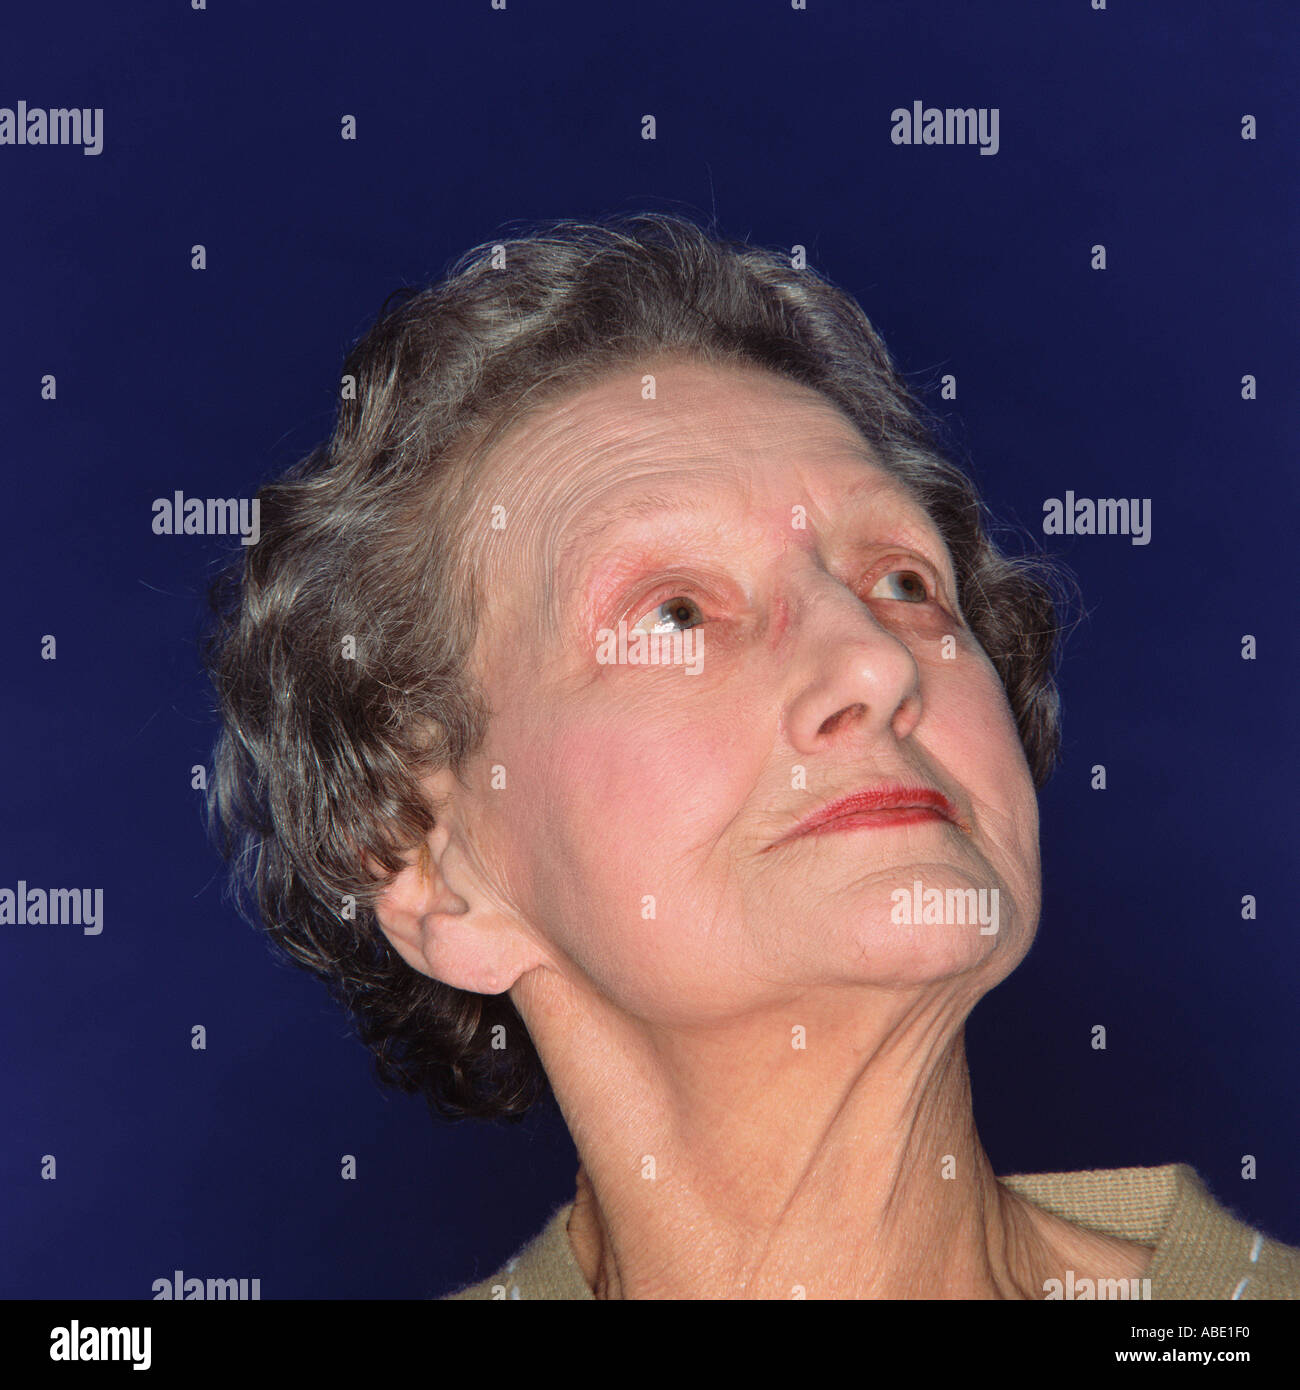 Porträt einer eleganten senior Frau Stockbild